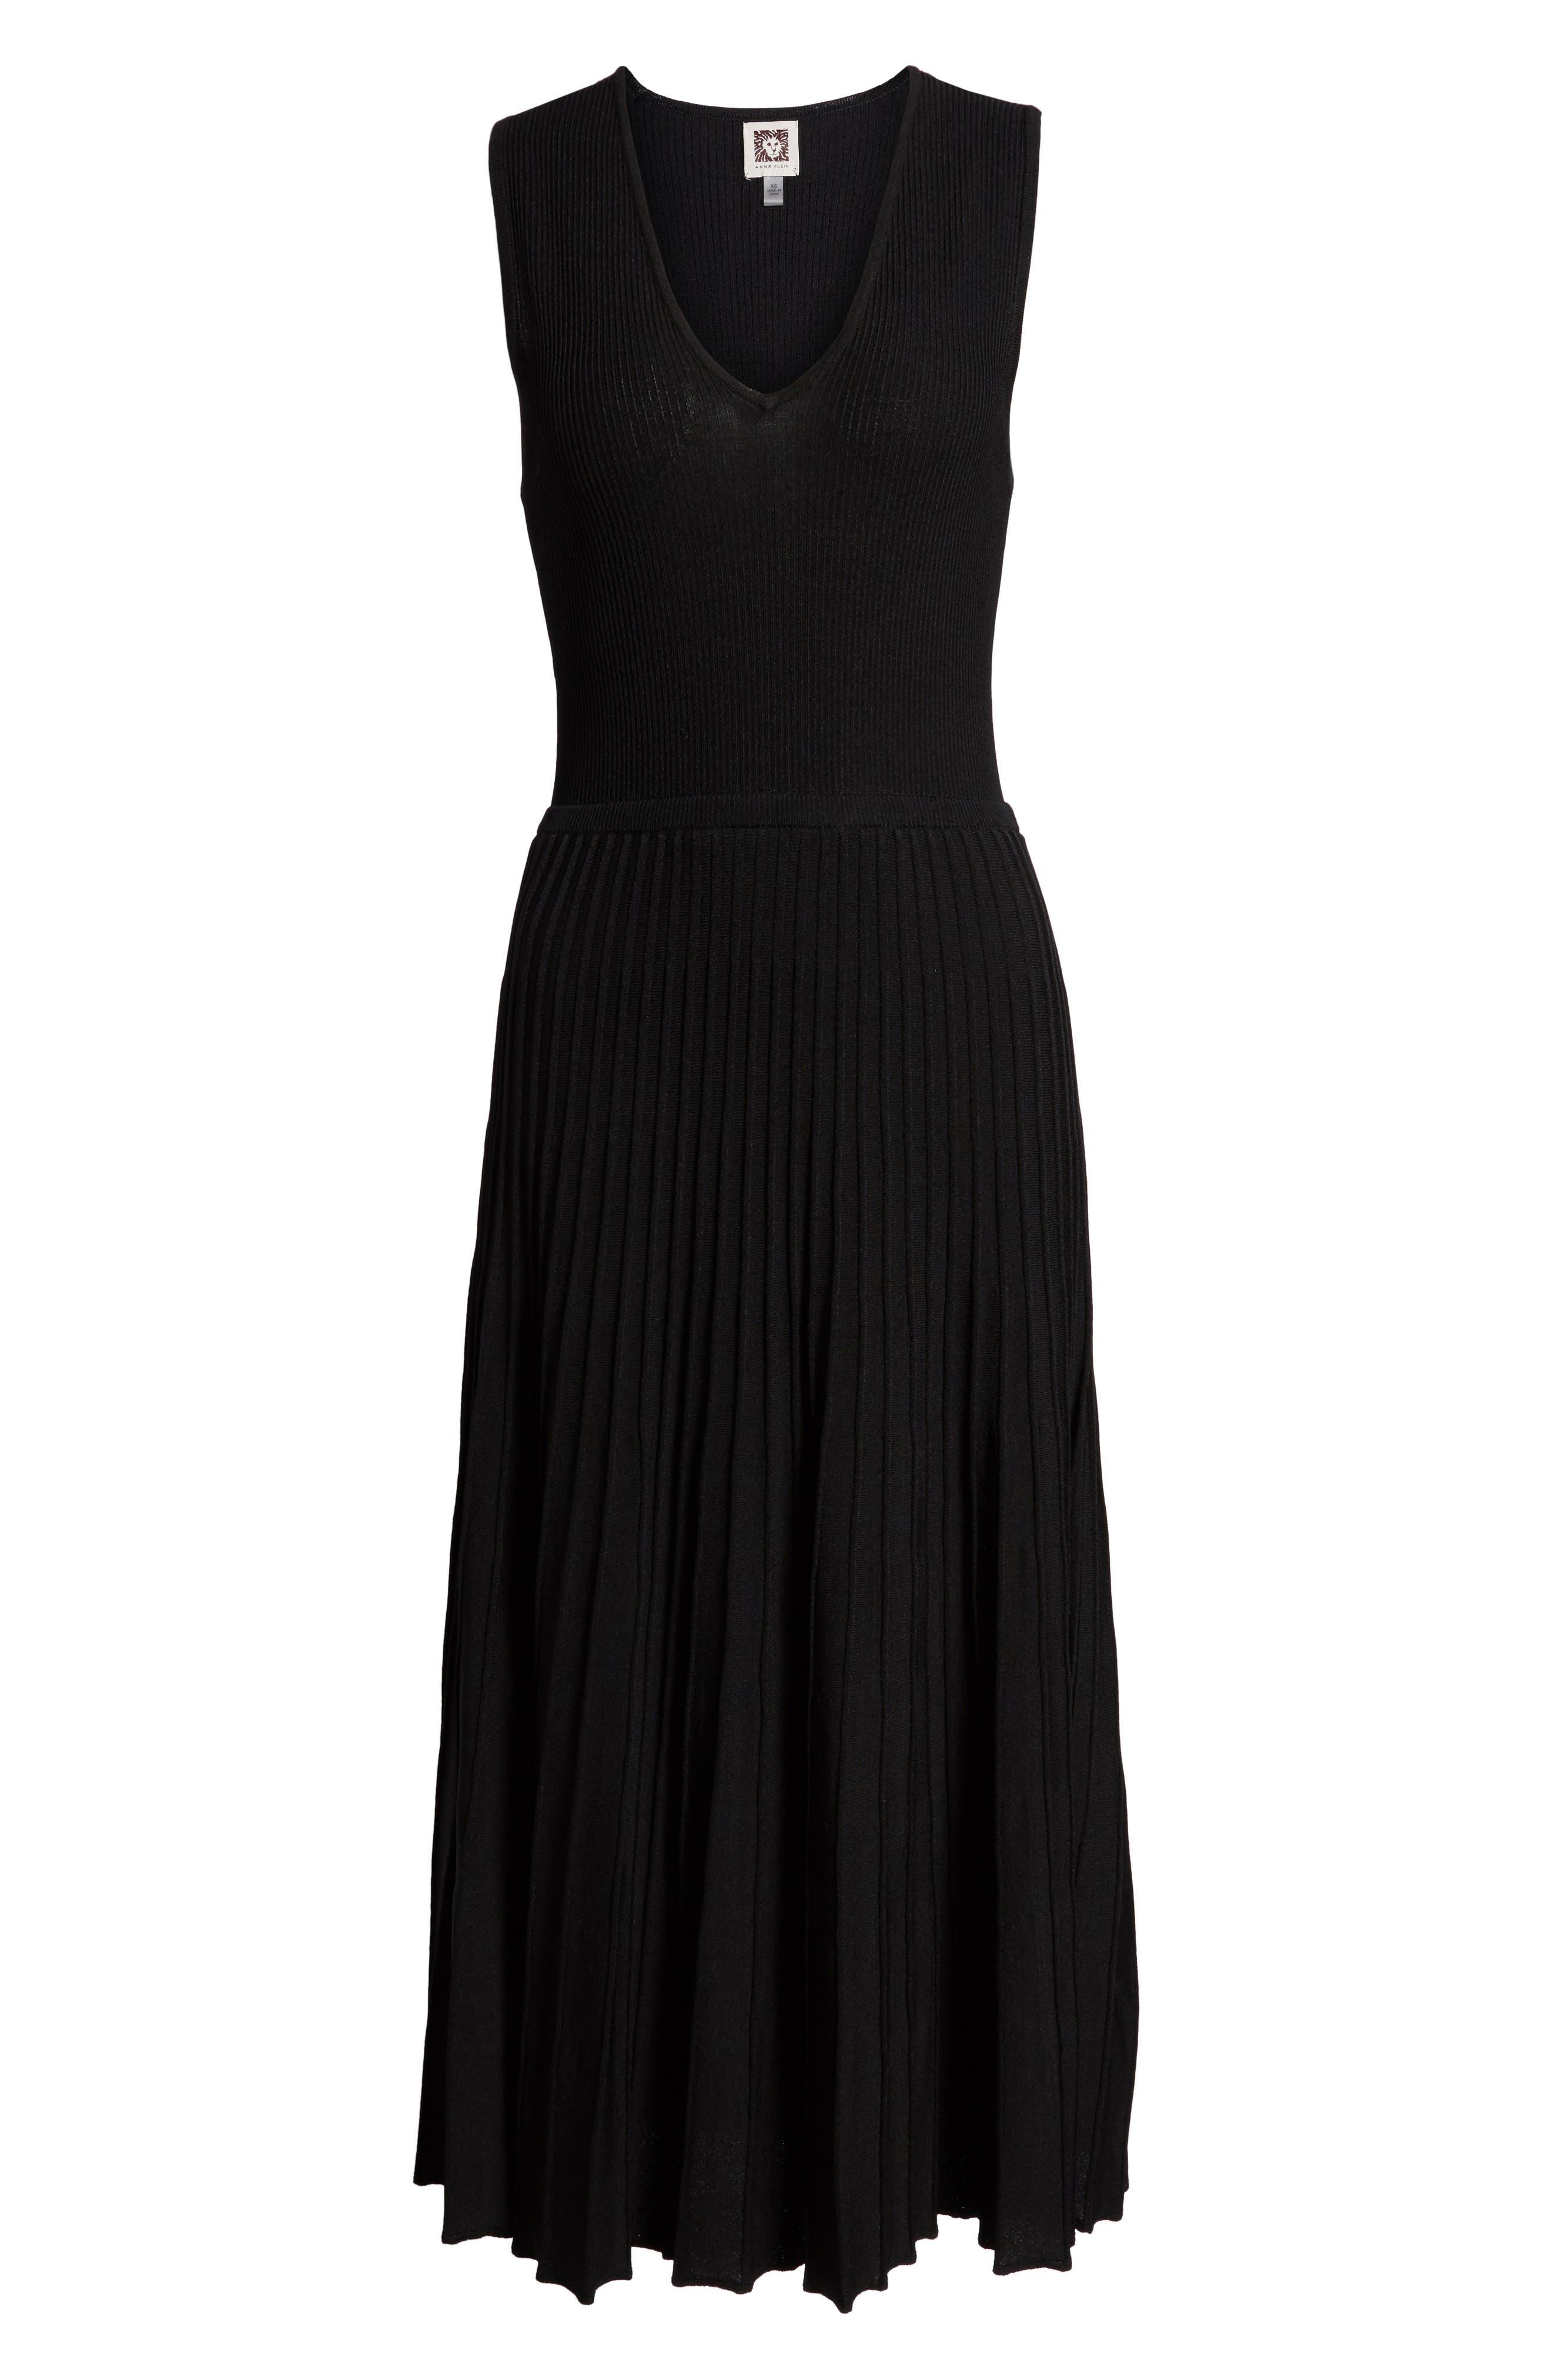 New York Pleated Sweater Midi Dress,                             Alternate thumbnail 6, color,                             Black